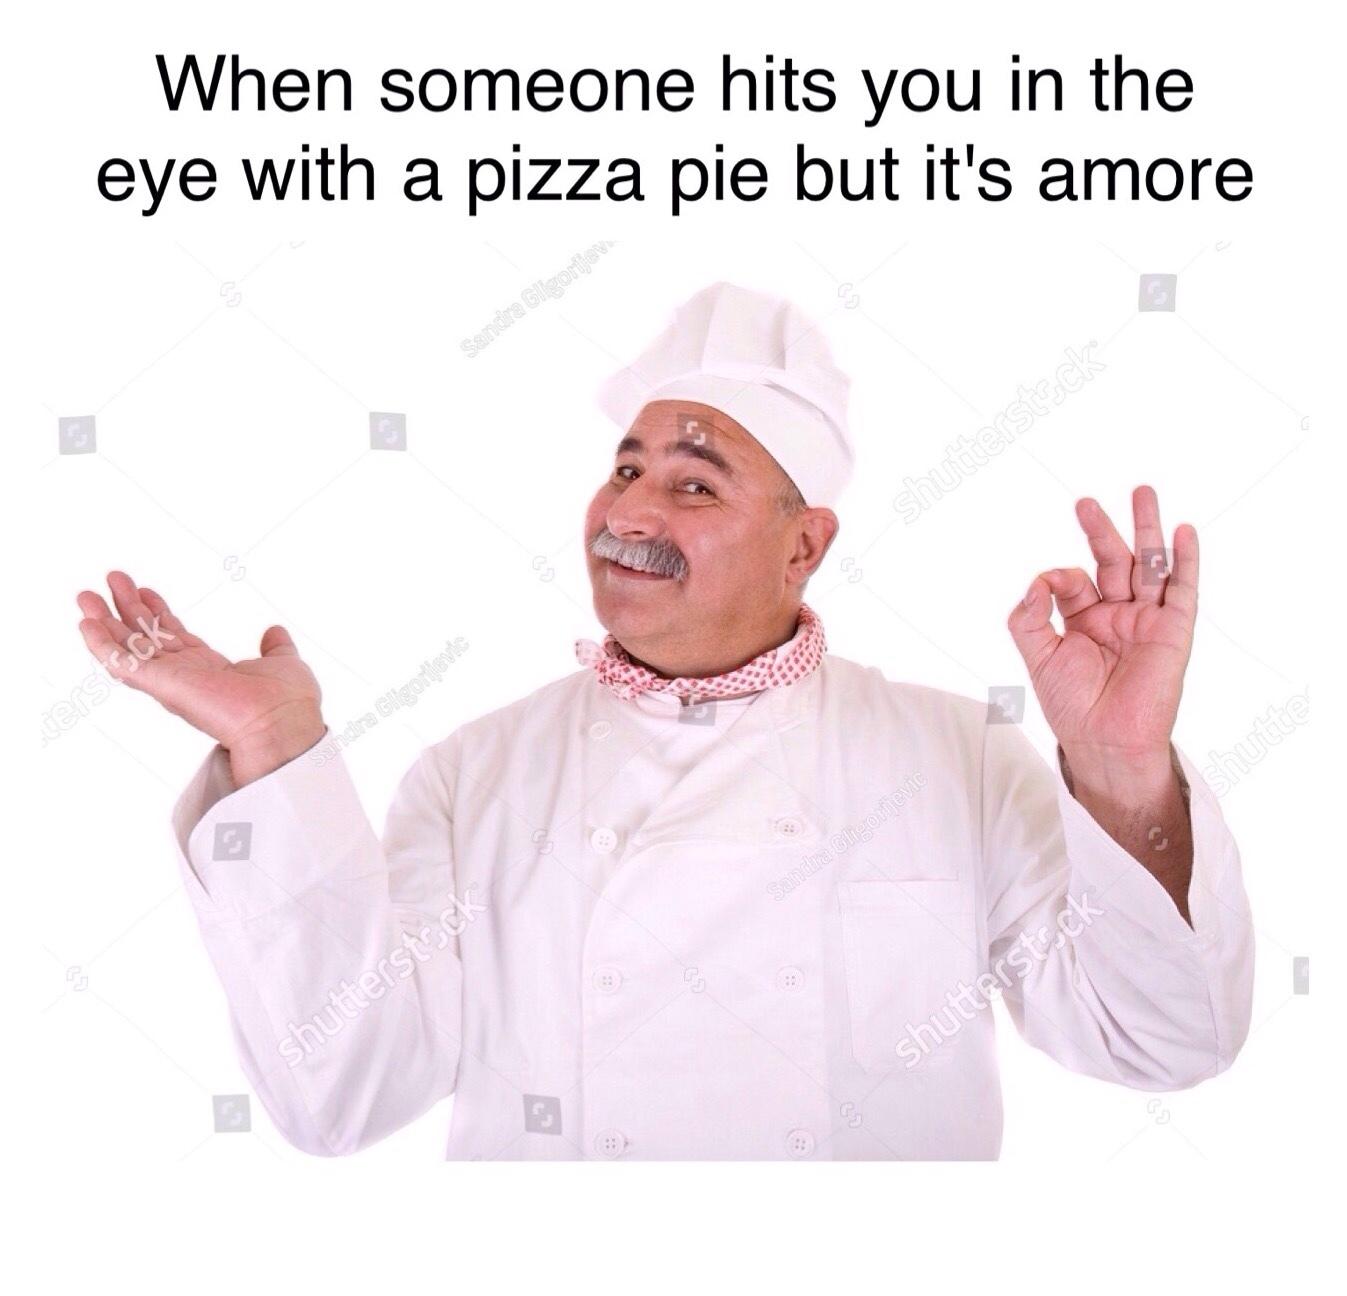 that's amorrrre - meme